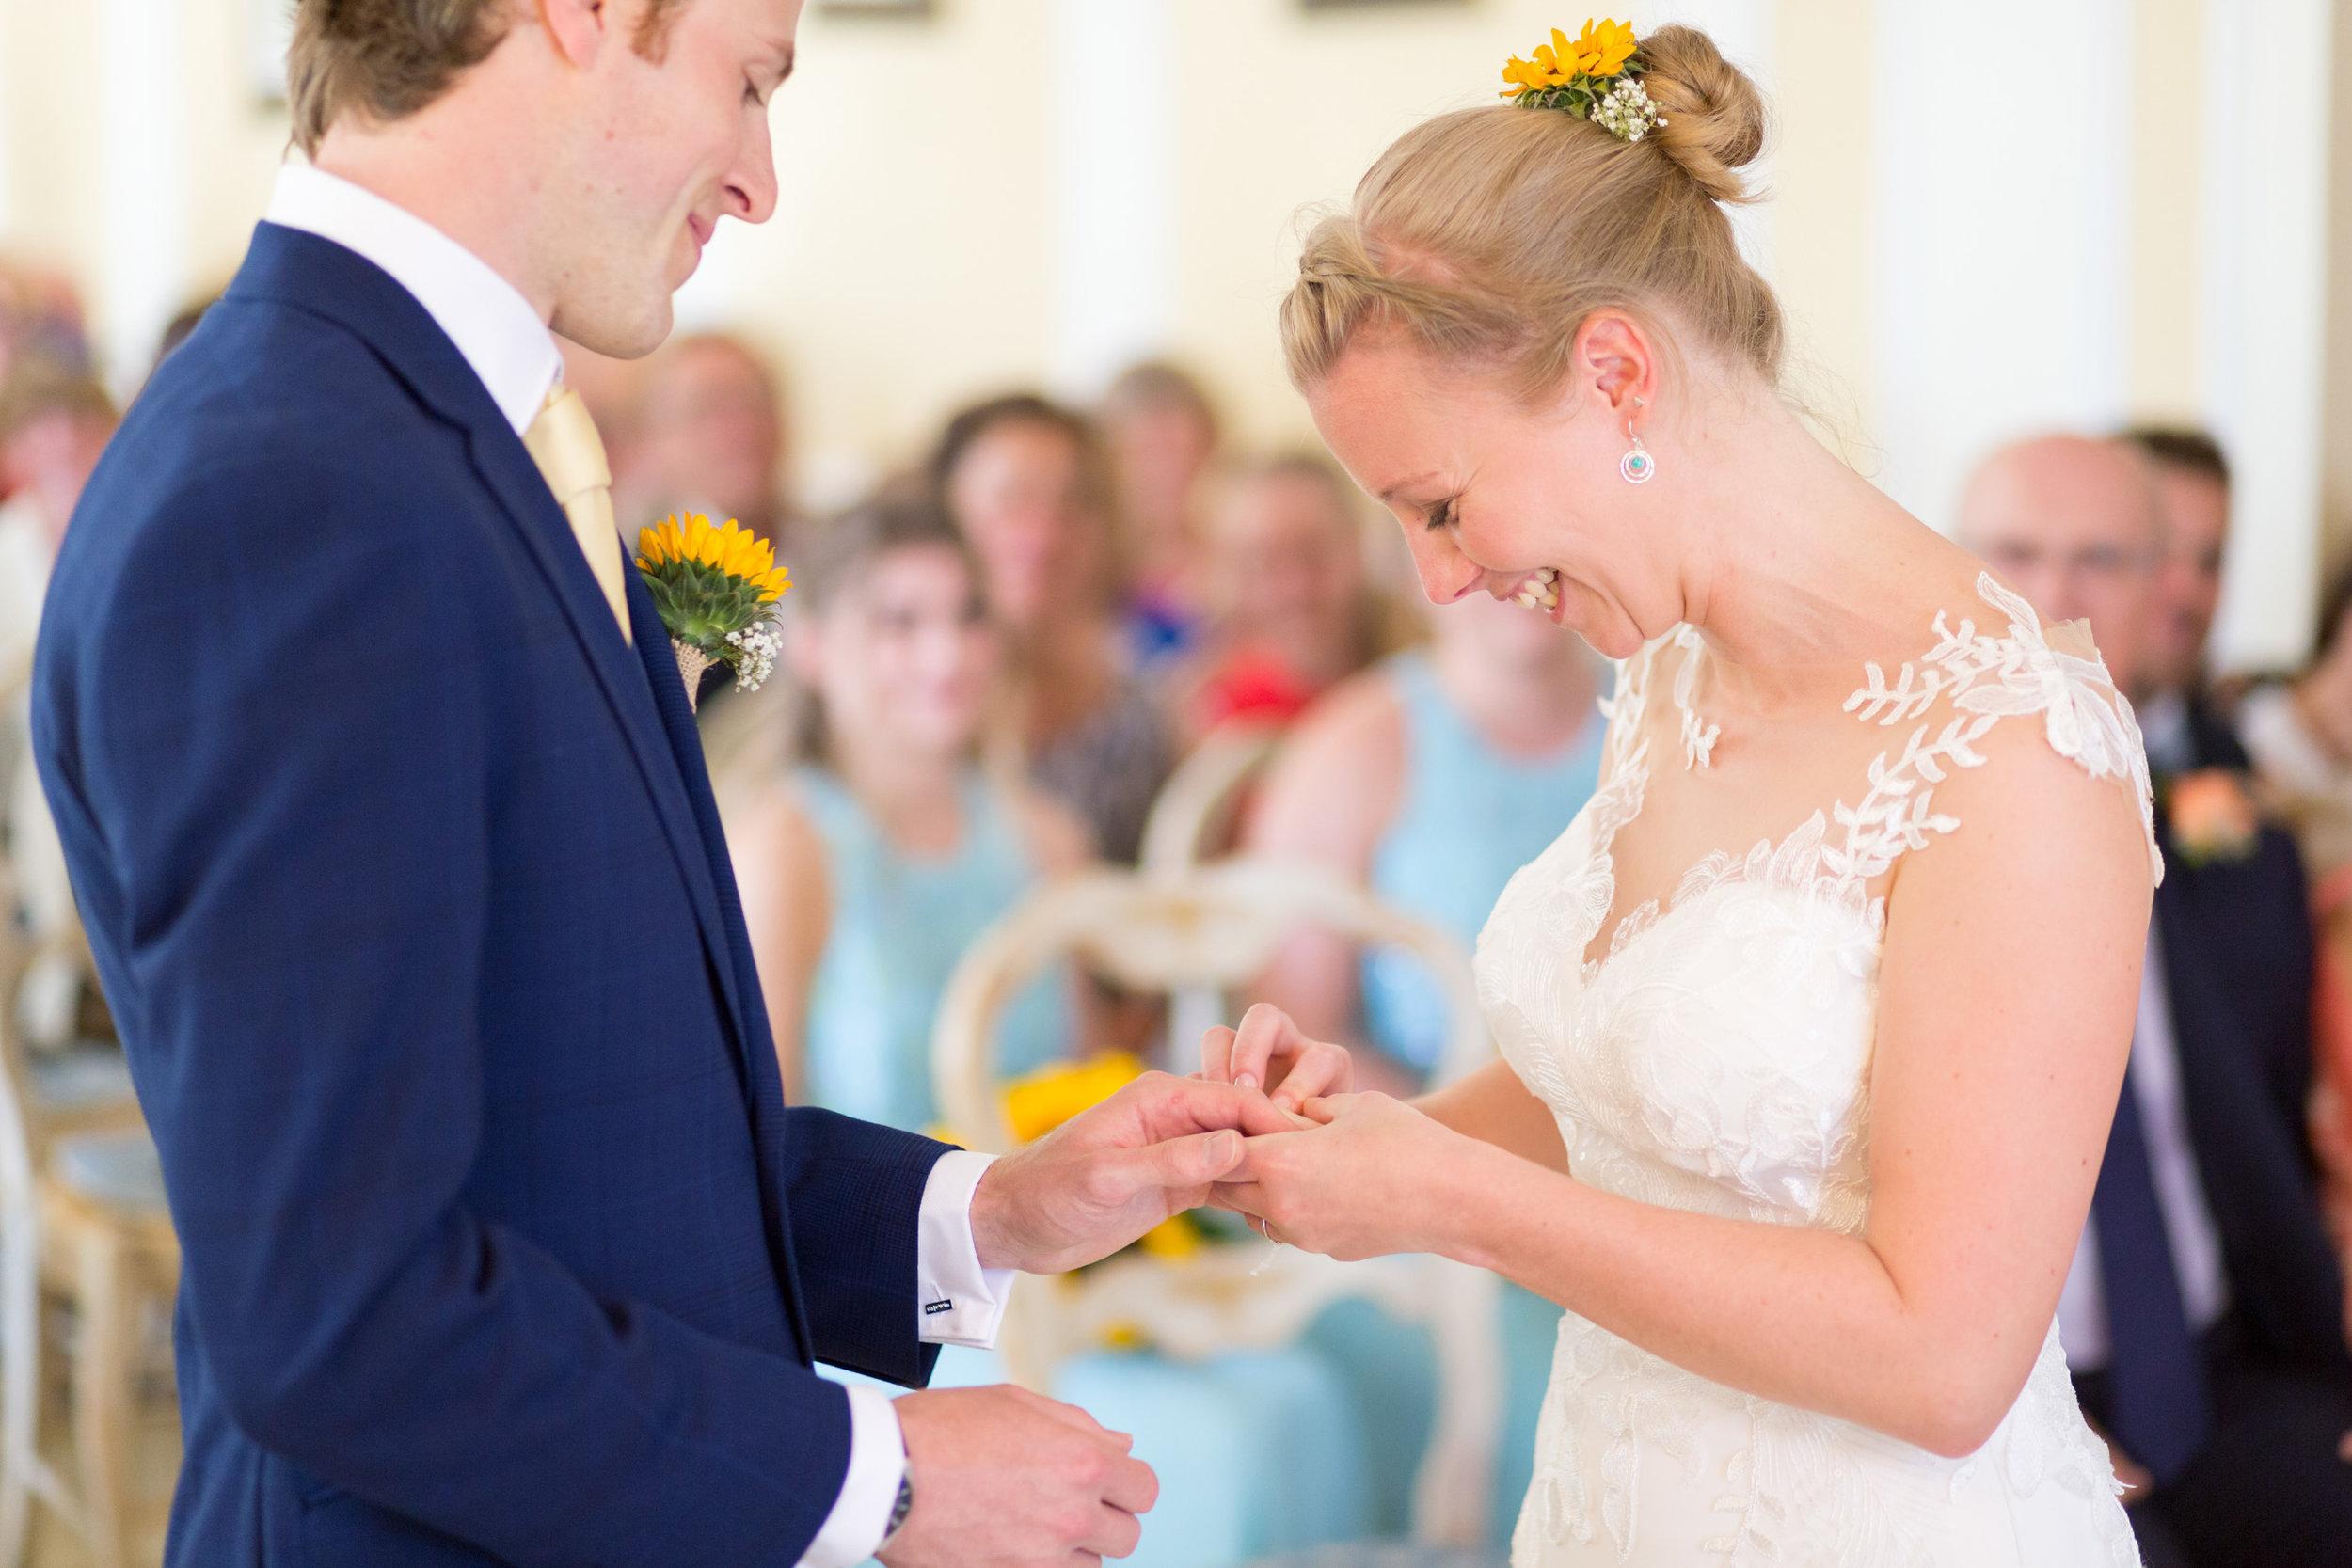 Bucklands-Tout-Saints-Hotel-Devon-Wedding-Photography-11.jpg